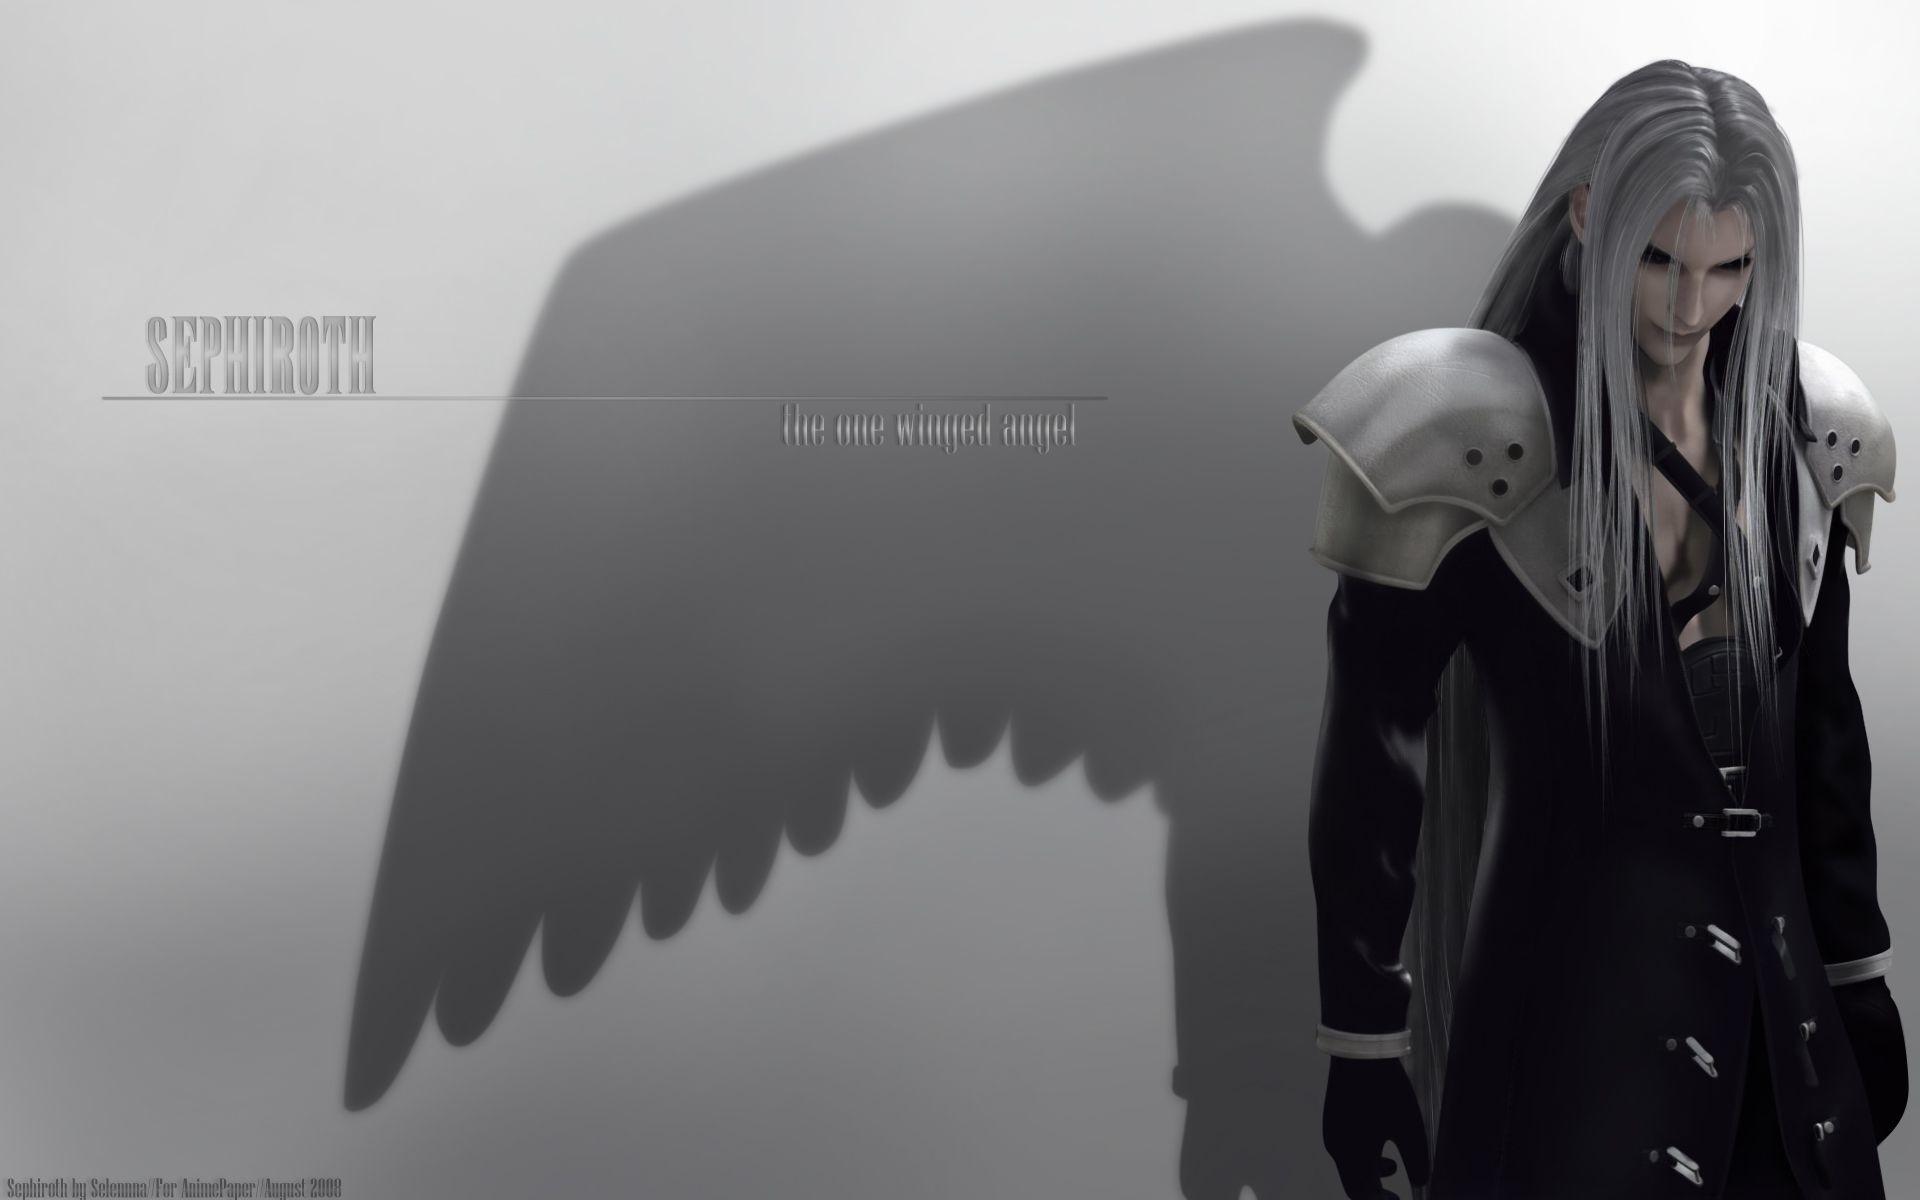 Final Fantasy Advent Children Sephiroth wallpaper 239306